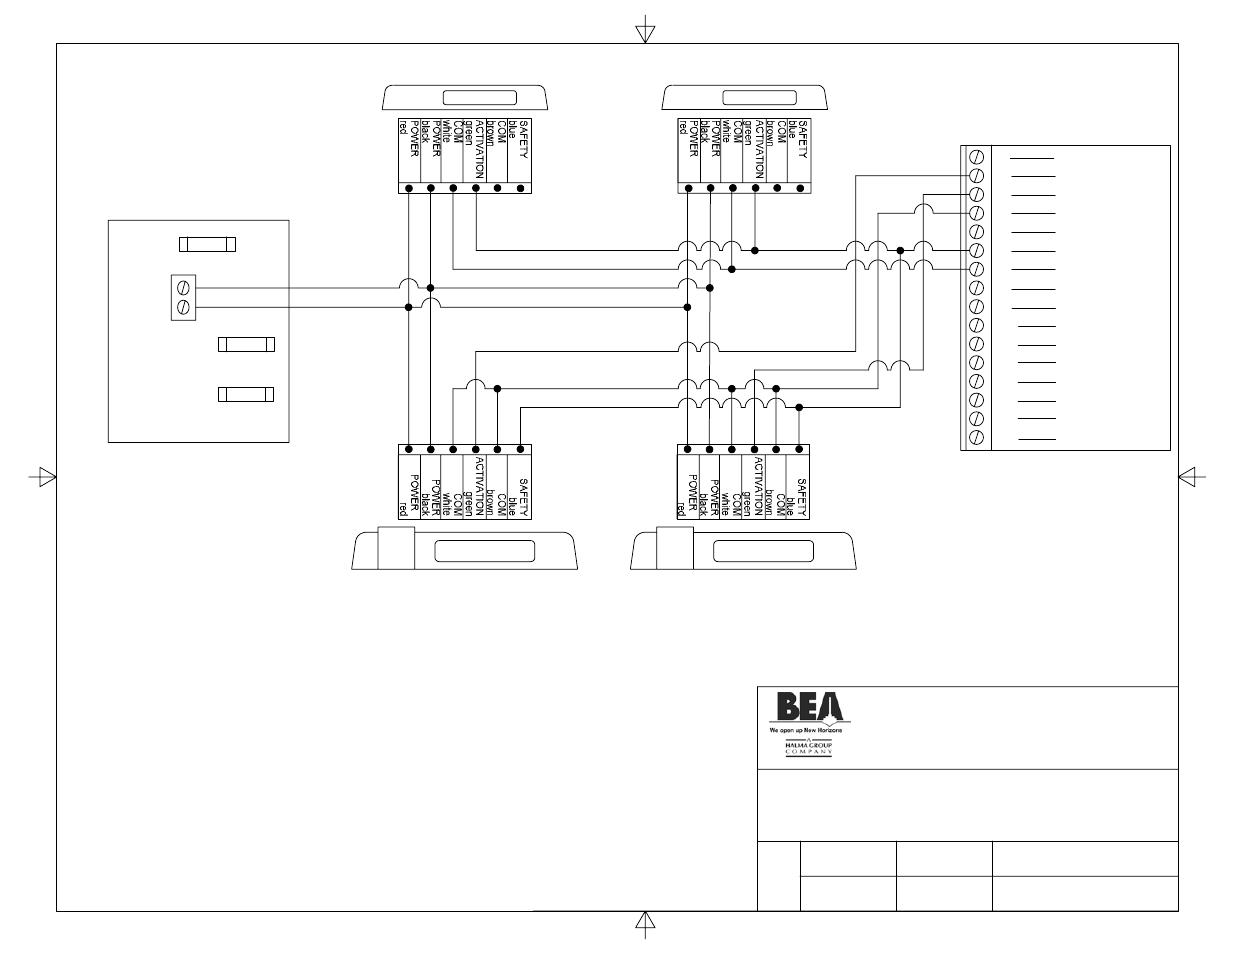 emg pa2 wiring diagram dodge neon radio afterburner harness